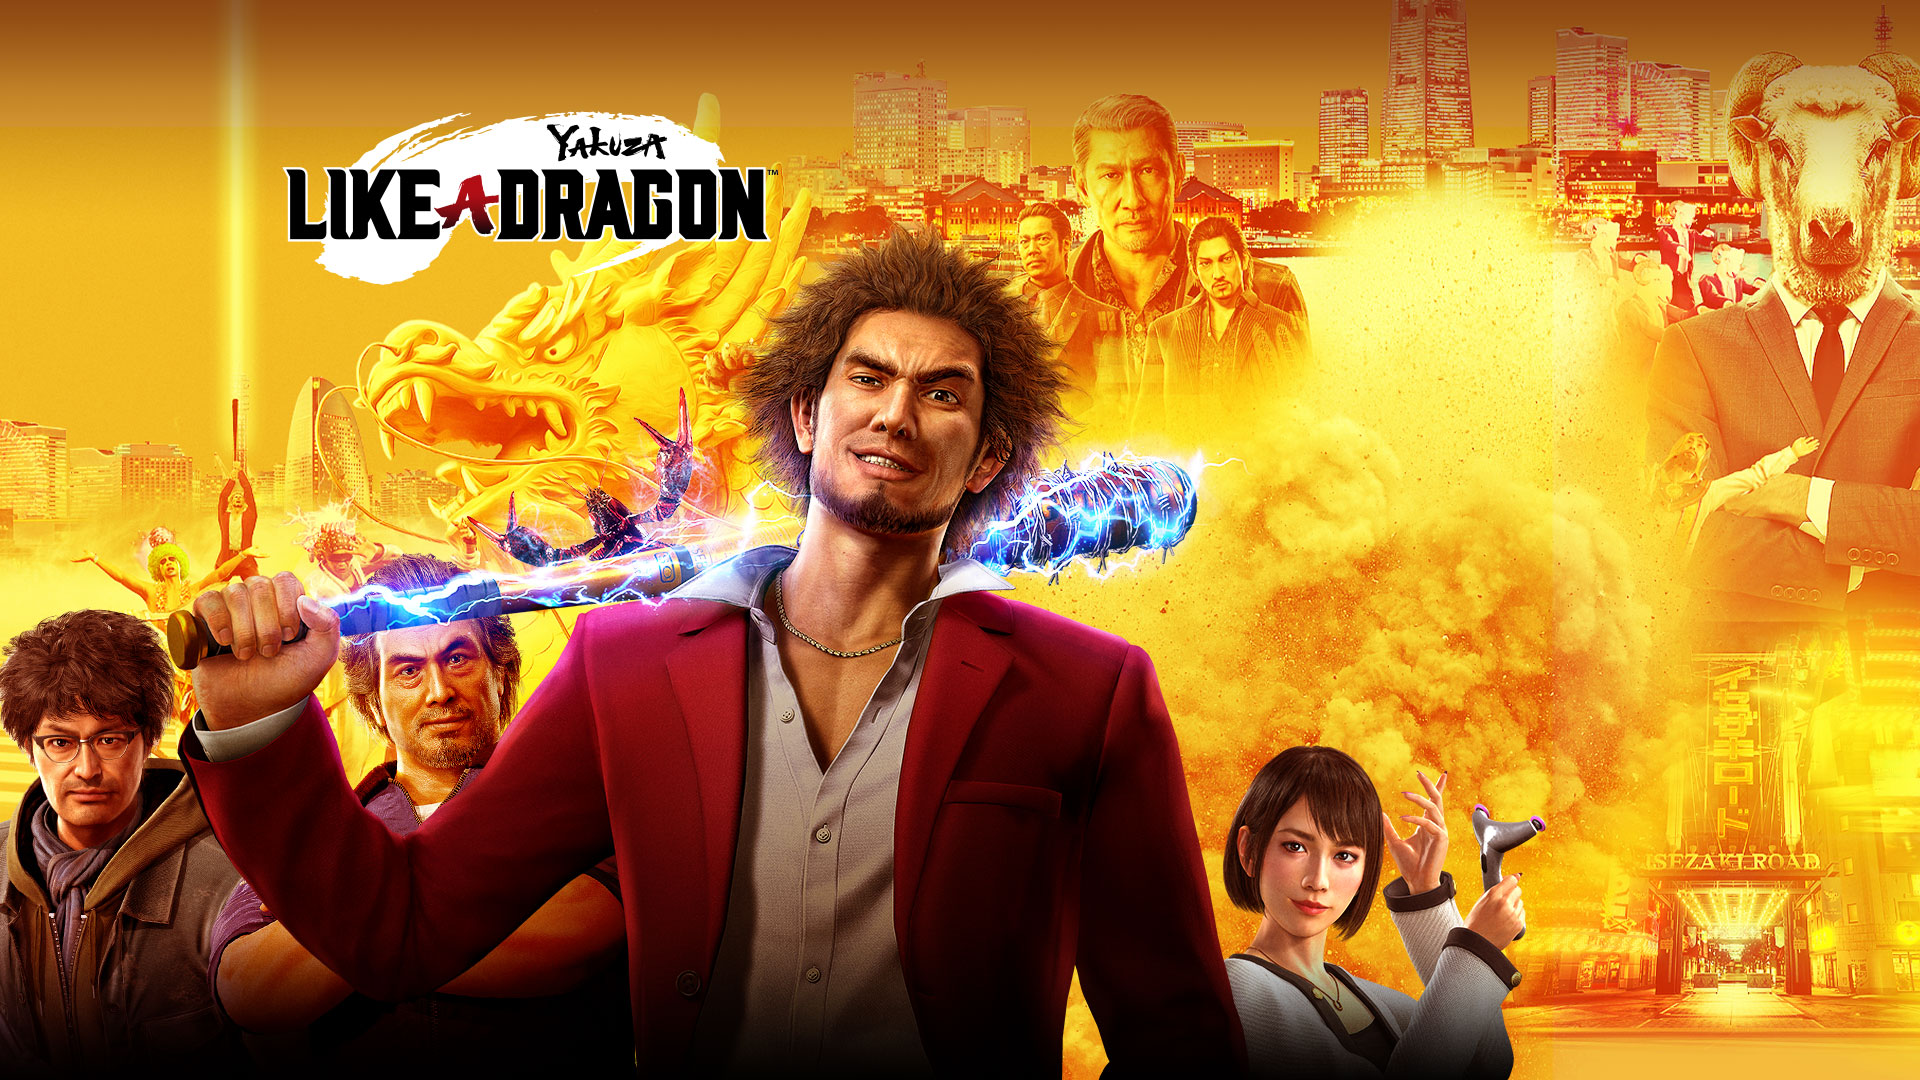 Yakuza ภาคหลังจากนี้จะเป็นเกม Turn-Based RPG เช่นเดียวกับภาคล่าสุด